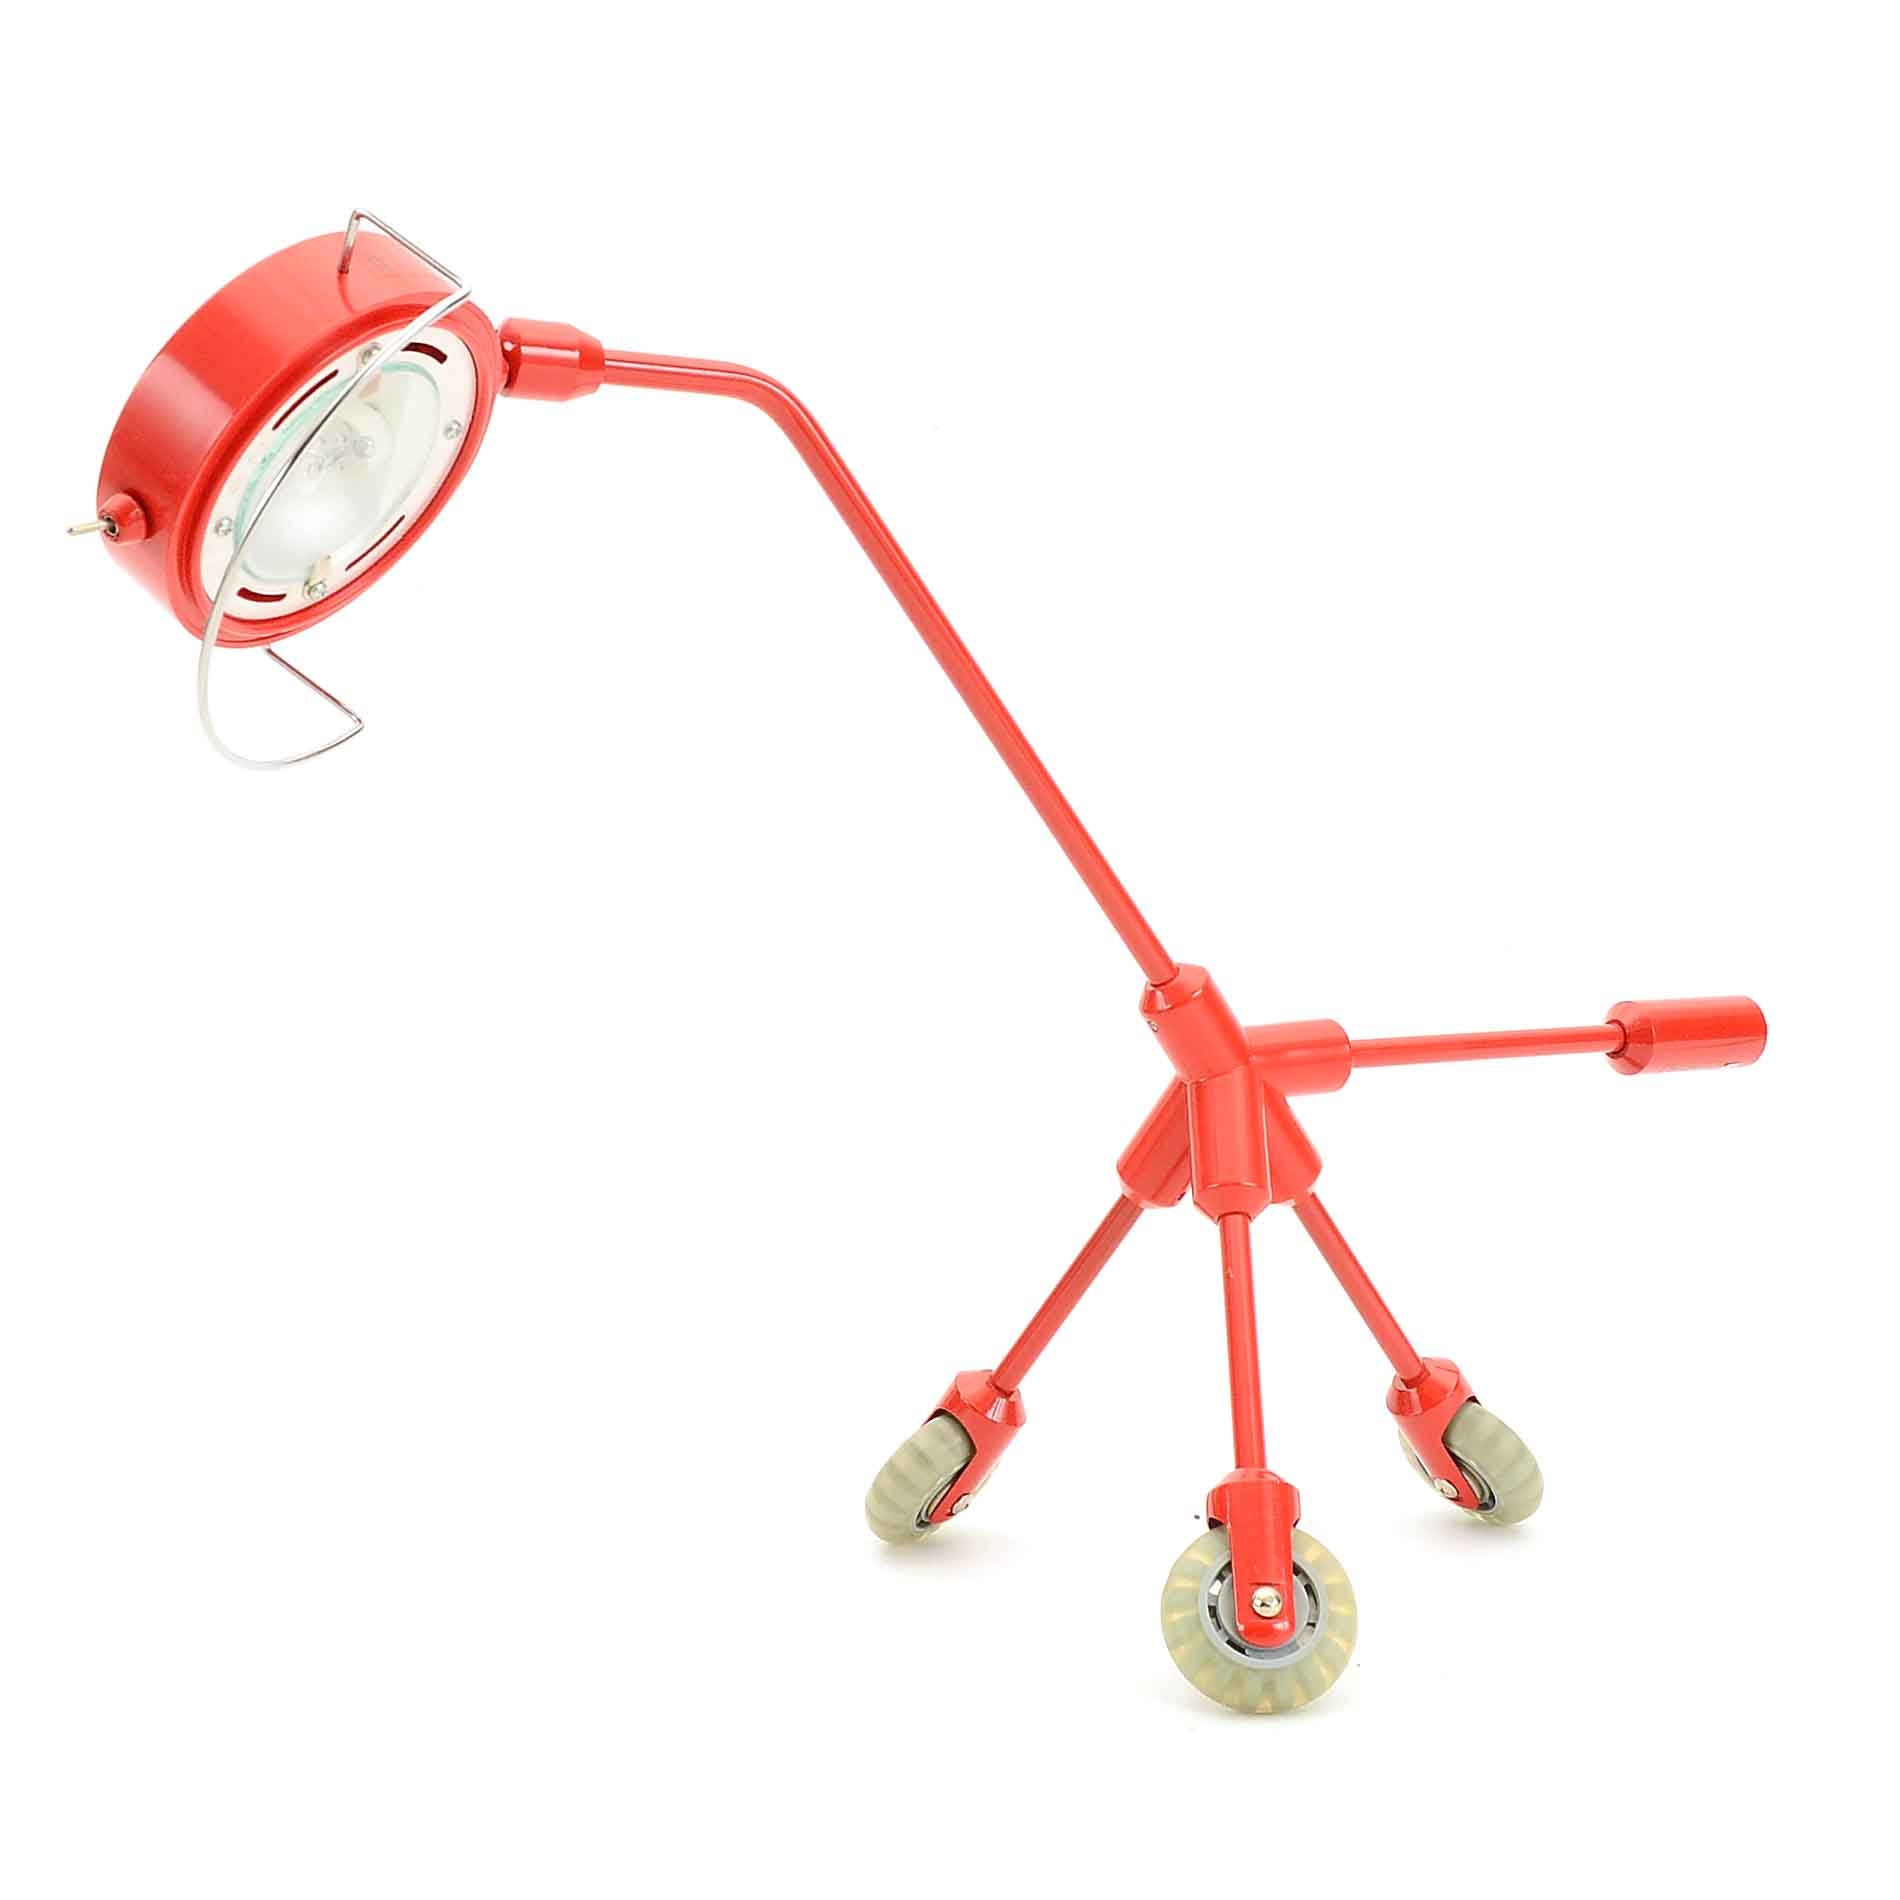 Modernist Ikea Desk Lamp